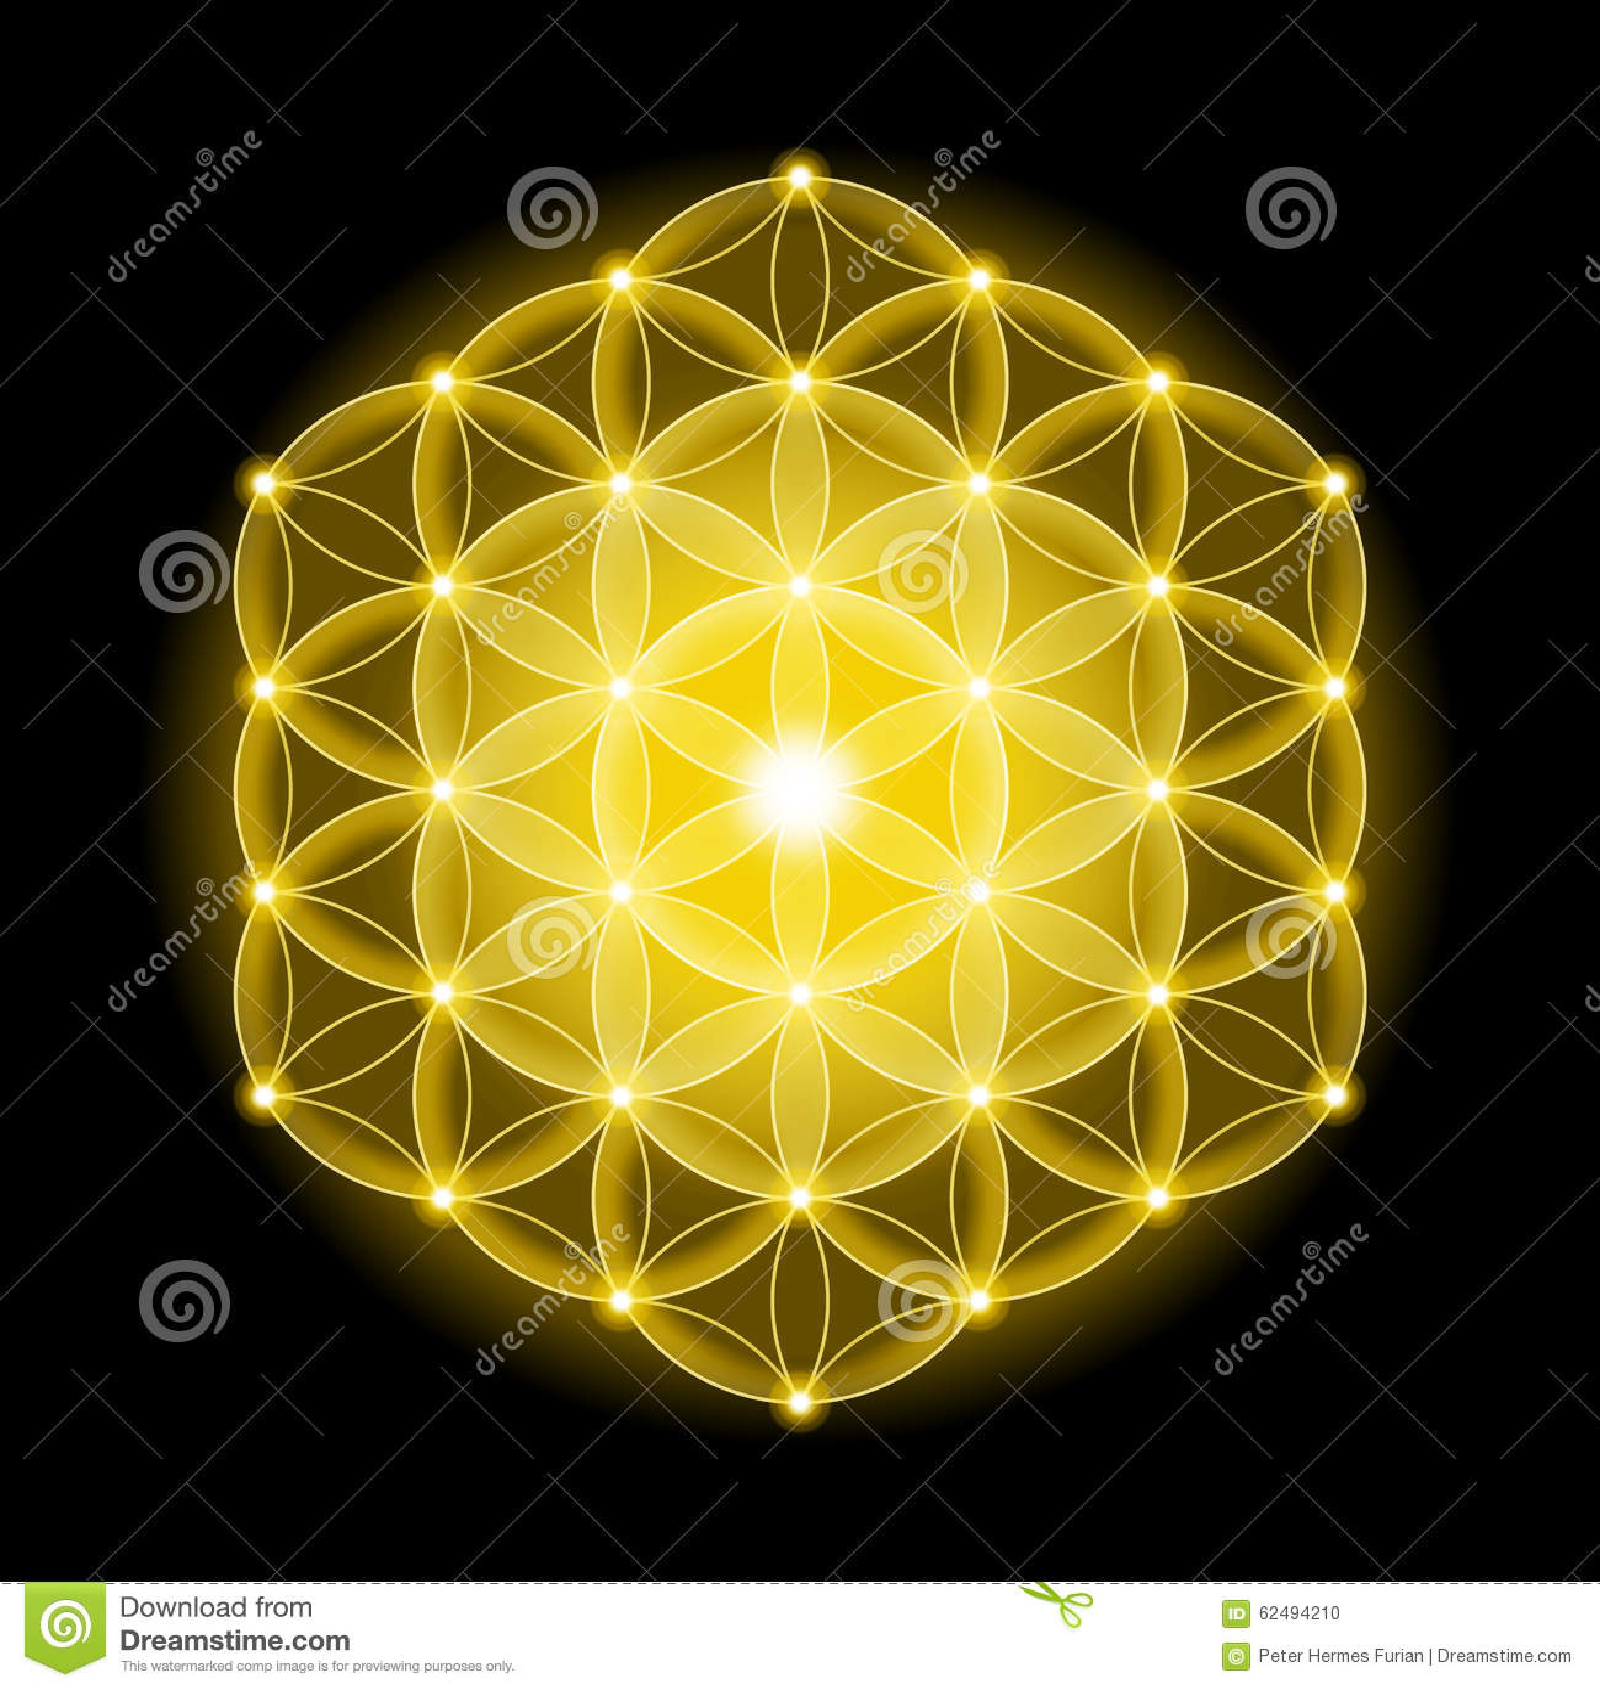 Golden Cosmic Flower Of Life With Stars On Black